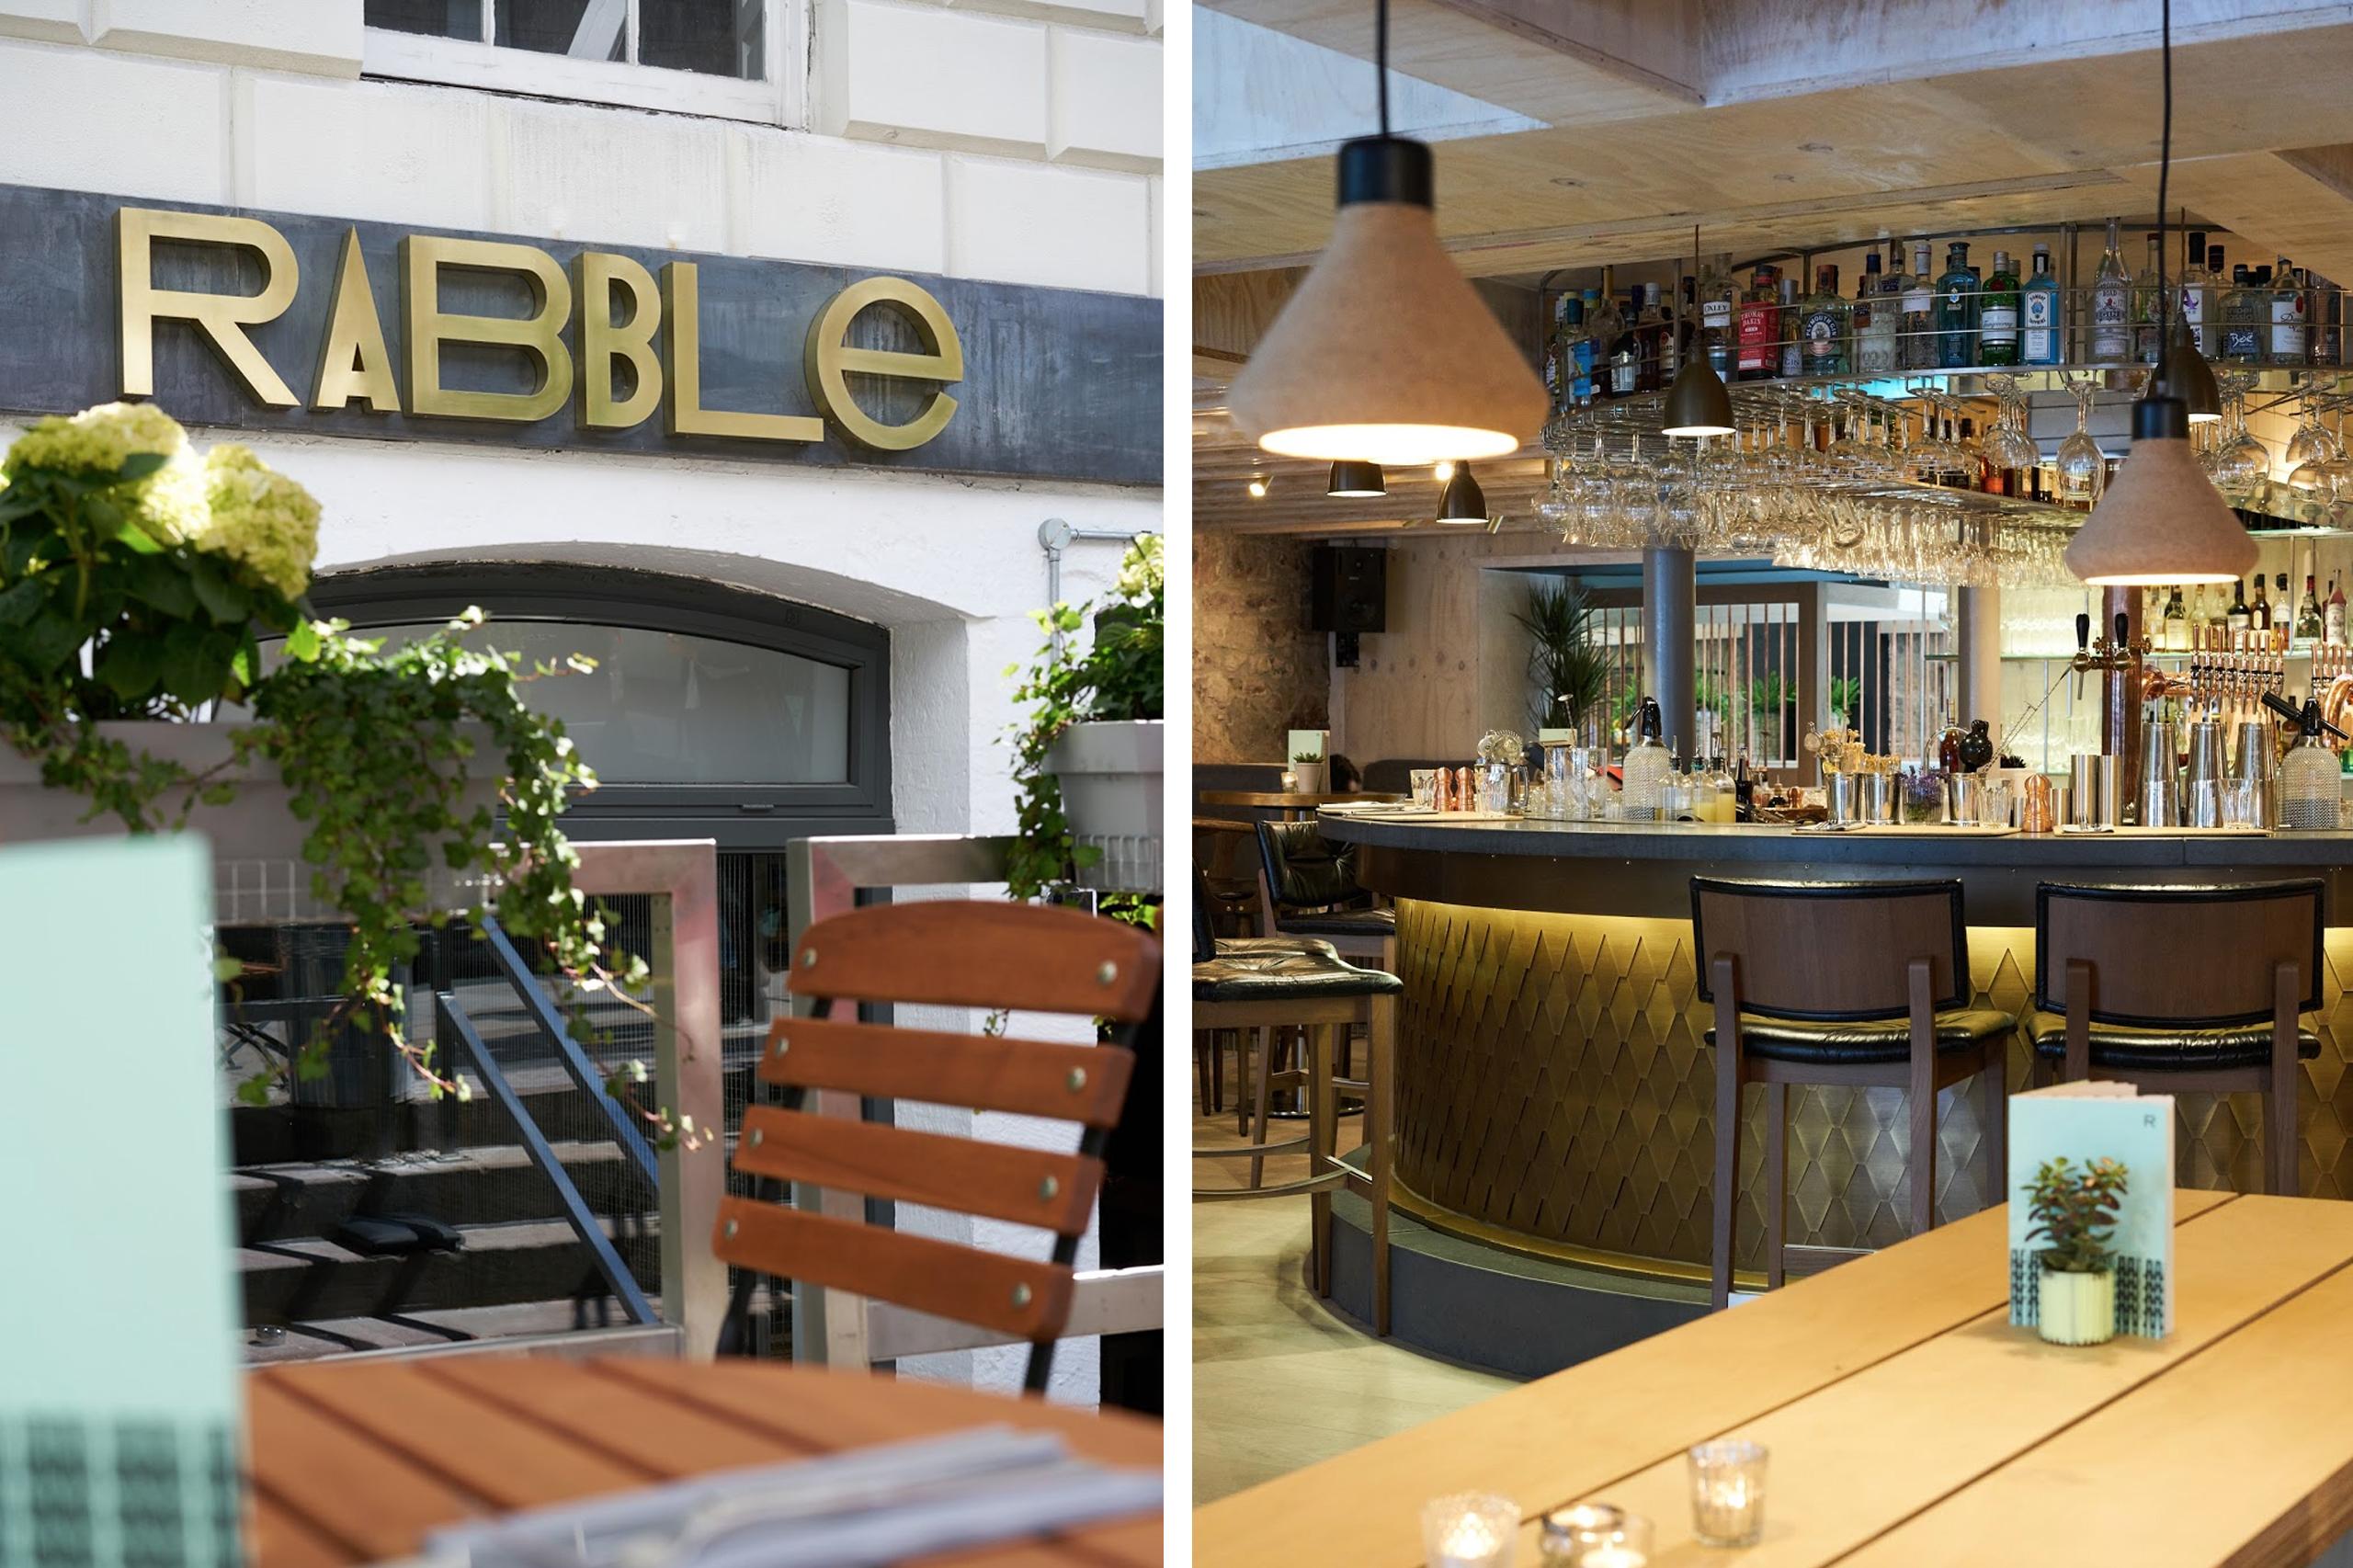 rabble-bar-hotel-edinburgh-2